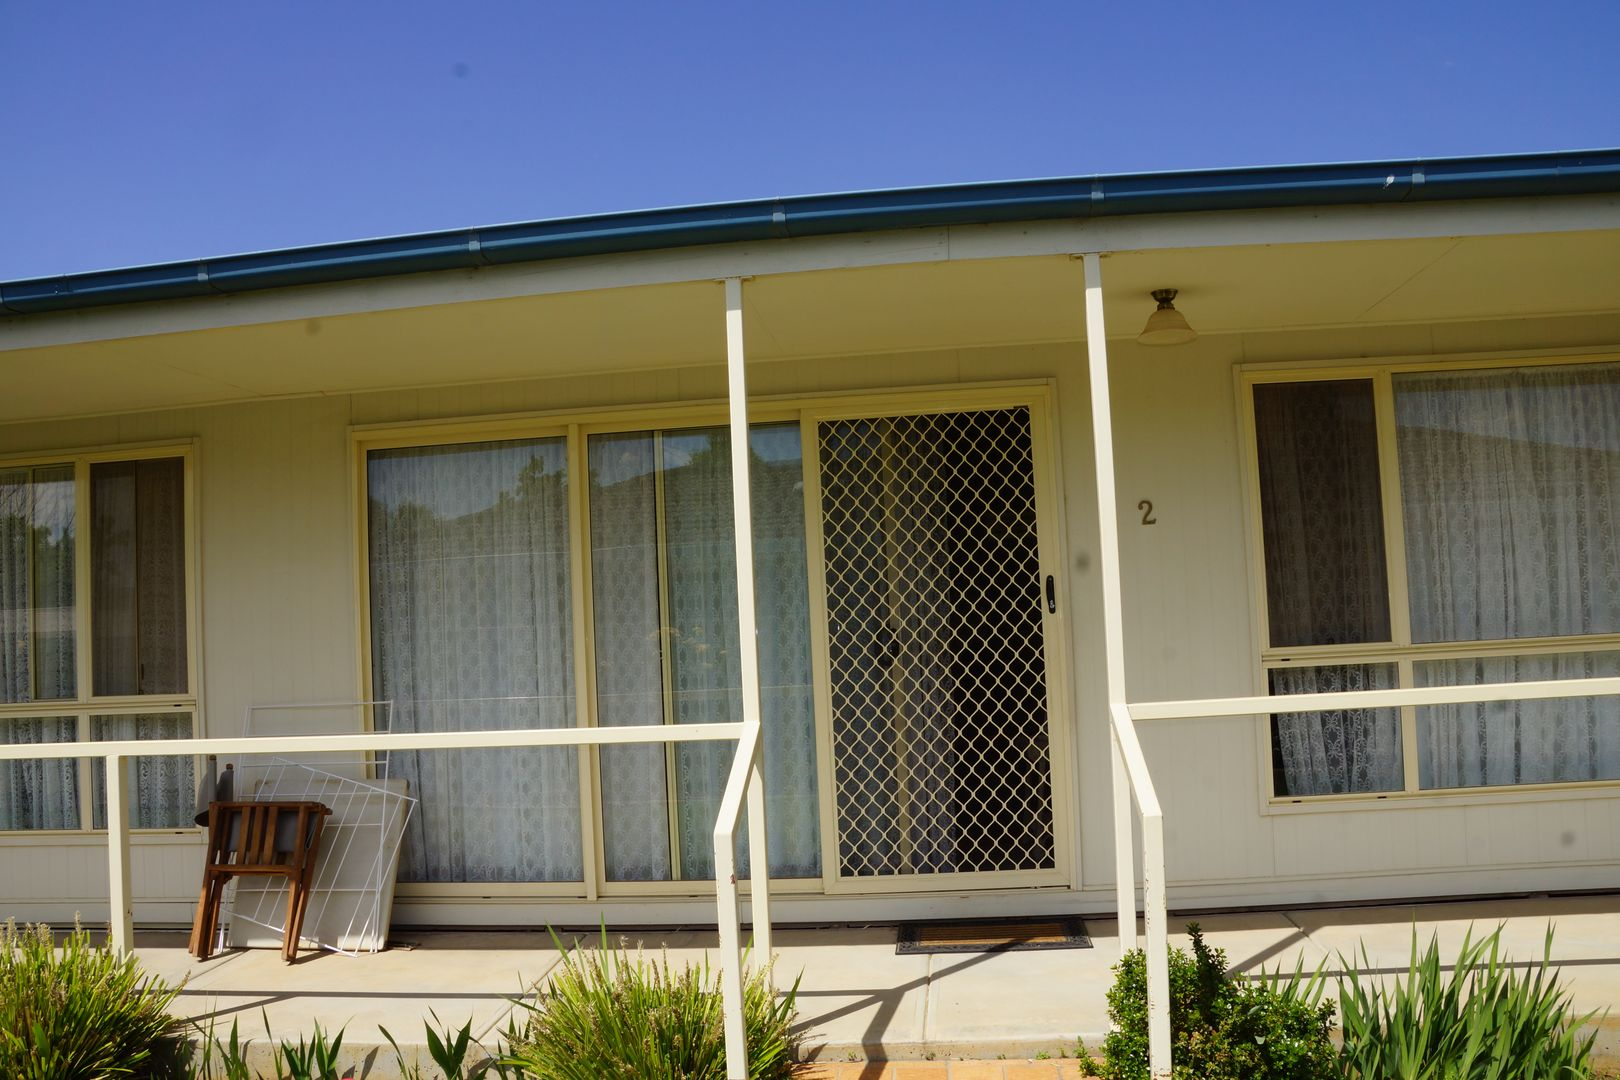 1/32 COREE STREET, Finley NSW 2713, Image 0